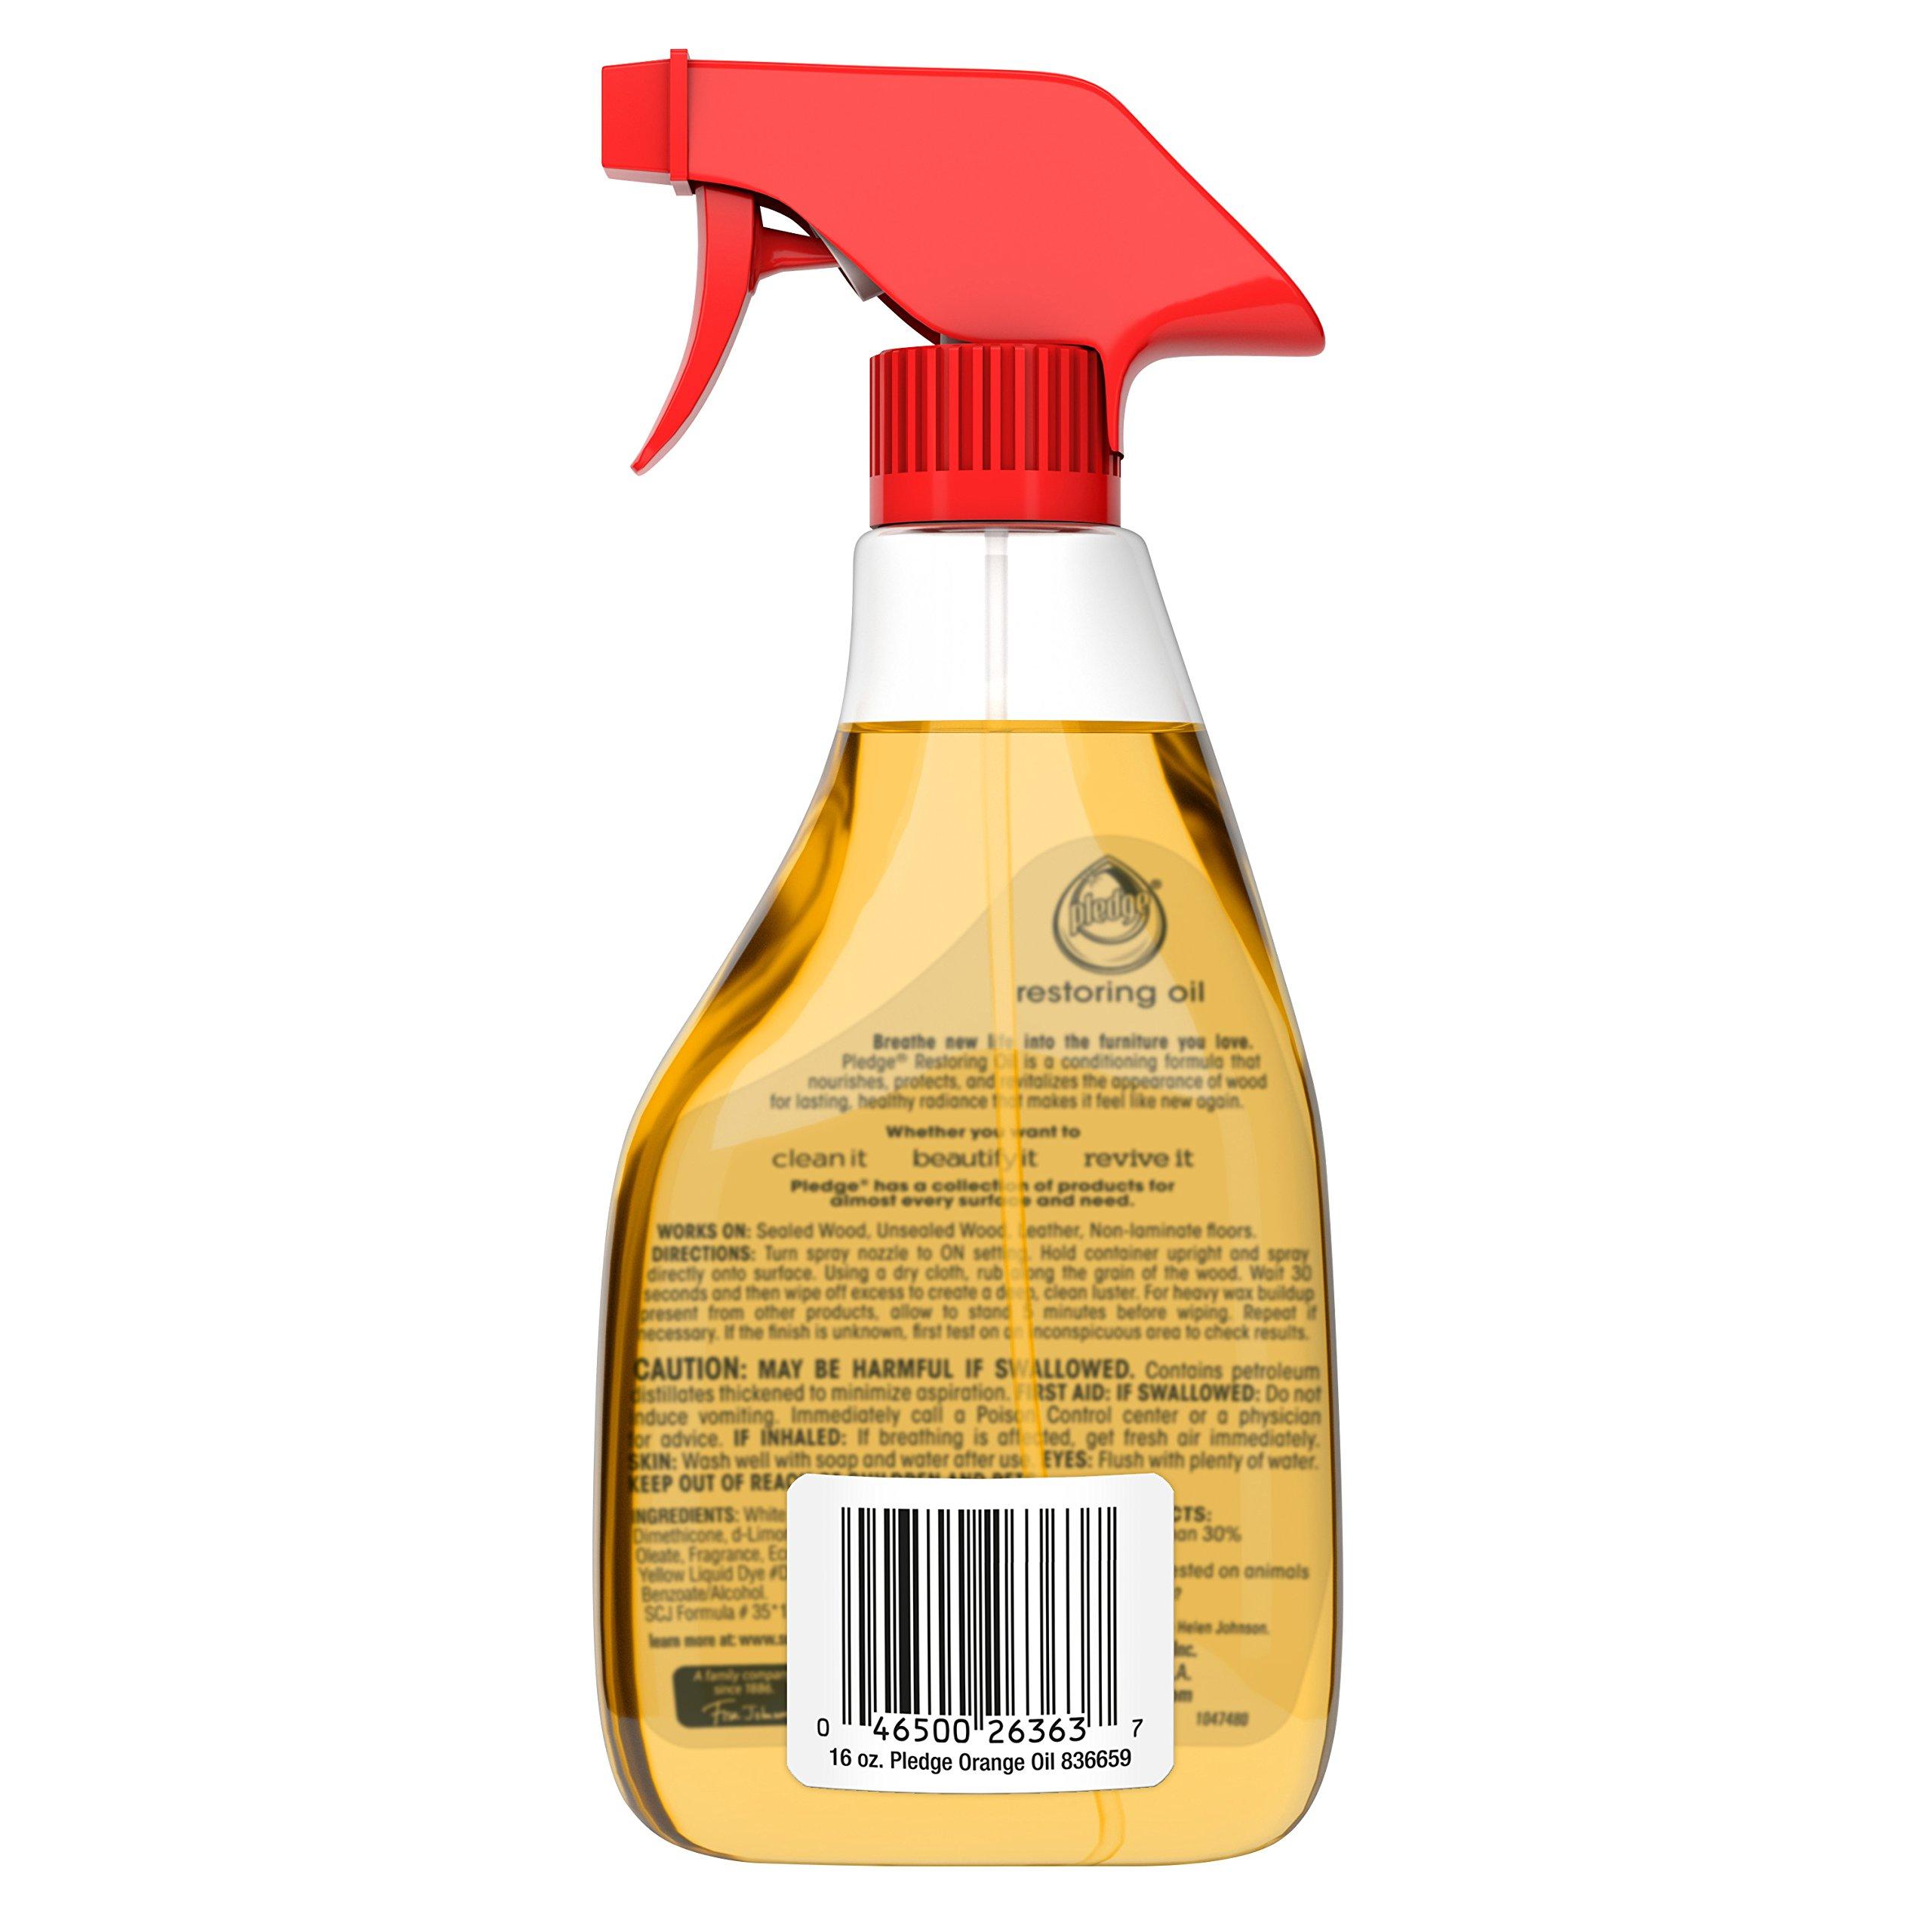 Pledge Revive It Restoring Oil (Orange, 16 oz - Pack of 4) by Pledge